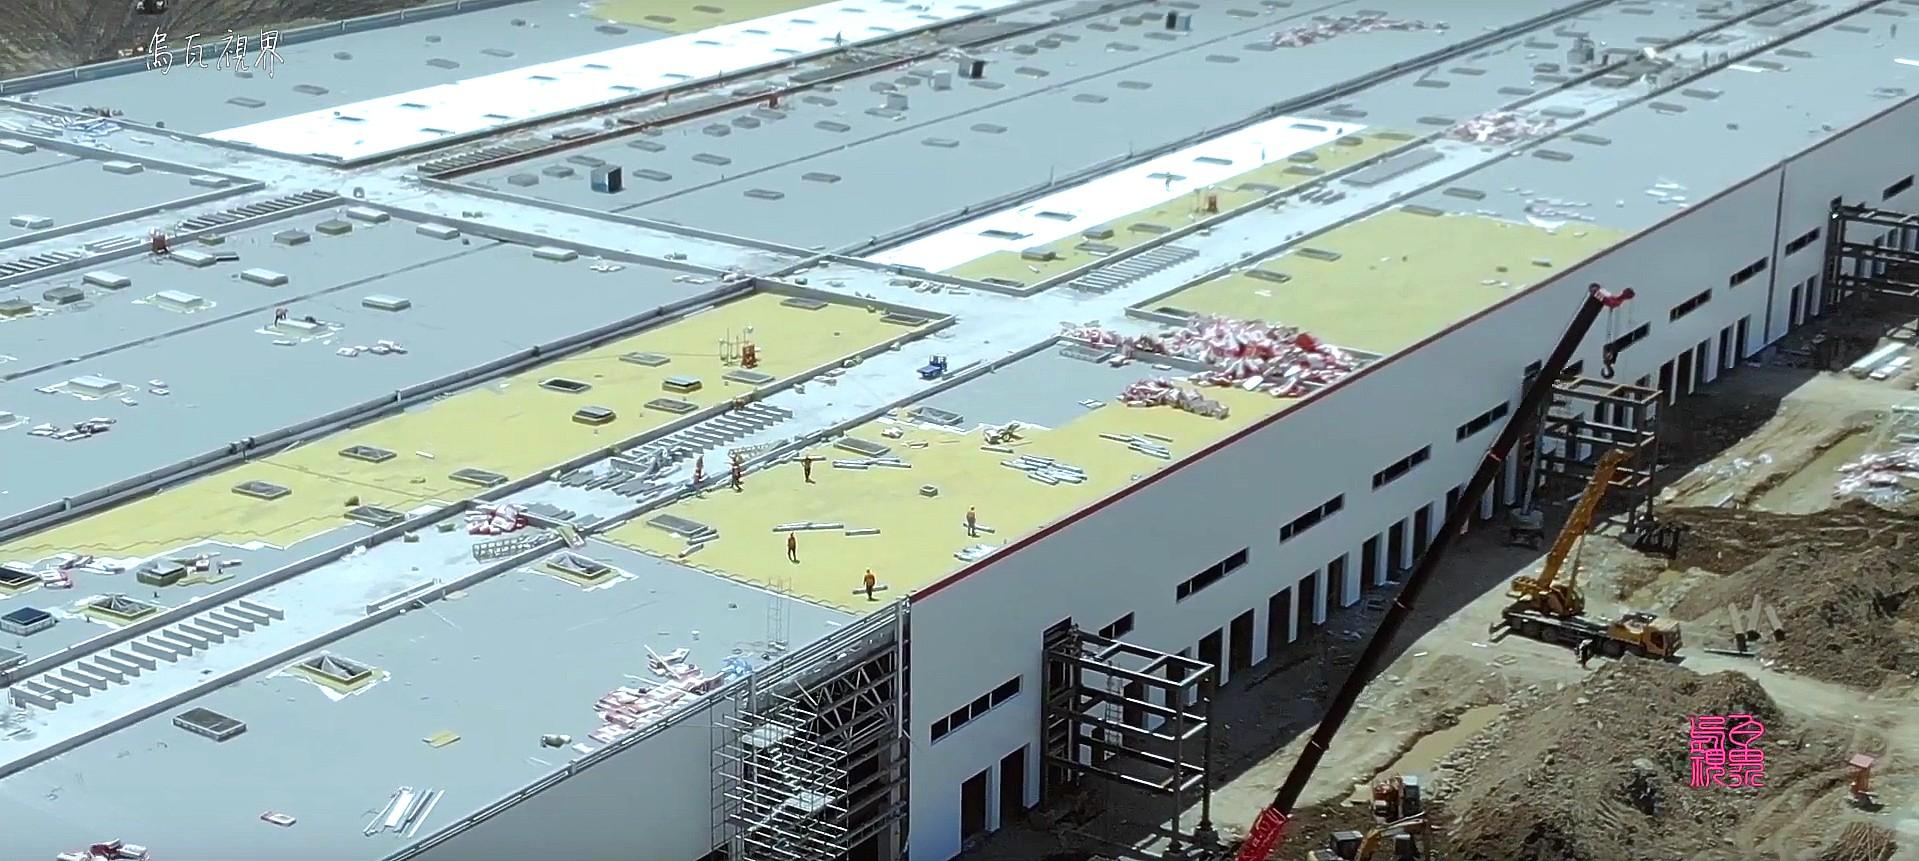 Tesla Gigafactory Jobs >> Tesla Opens Jobs For Gigafactory 3 As First Images Of Factory